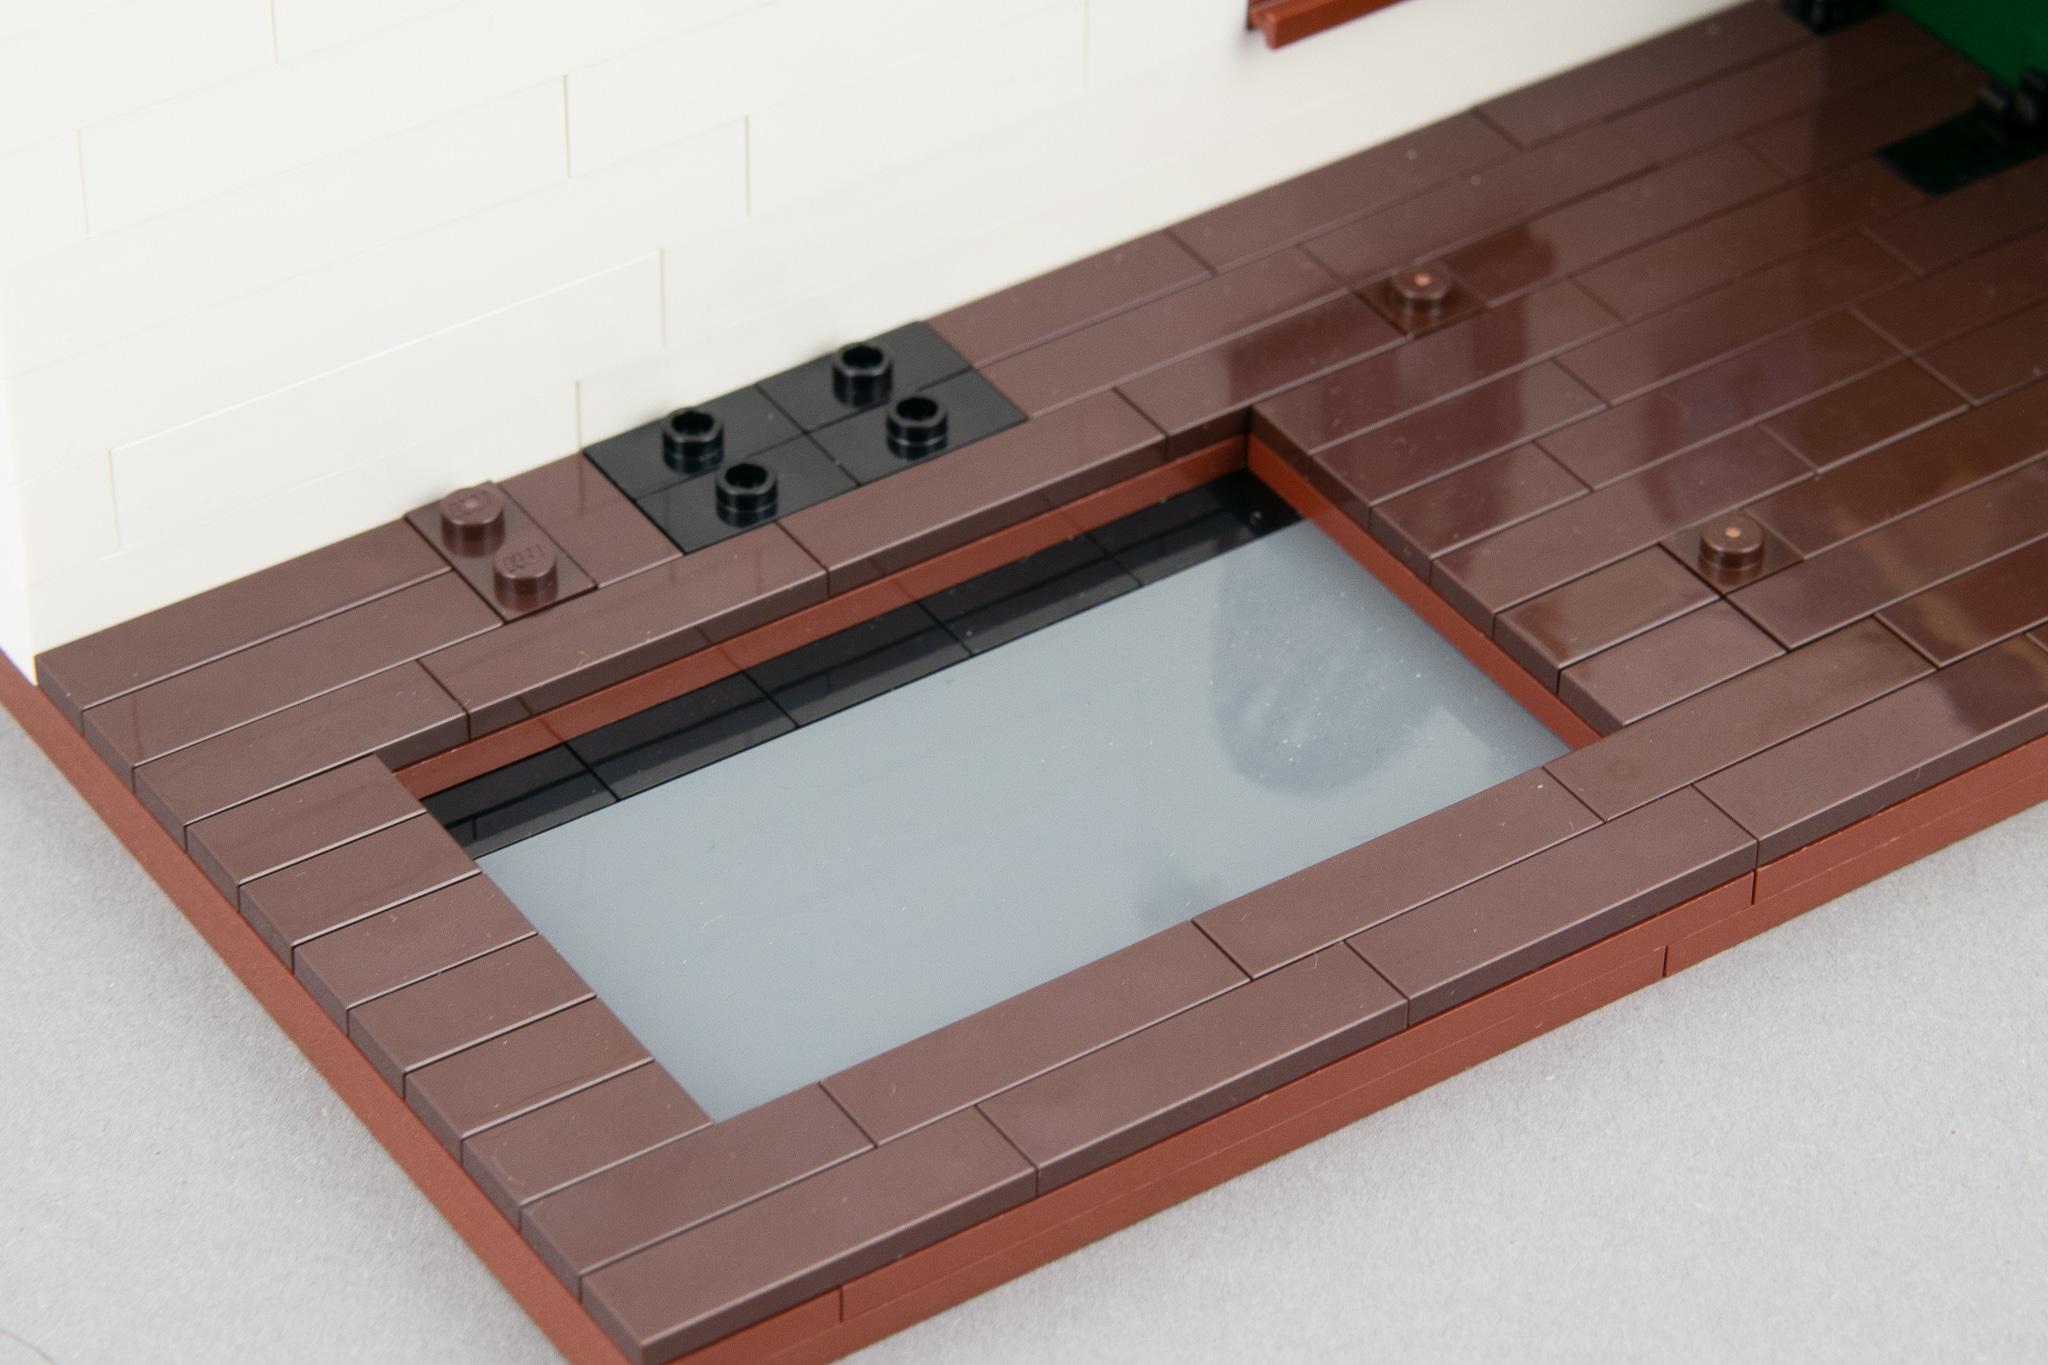 LEGO Schlafzimmer Moc Teppich (5)